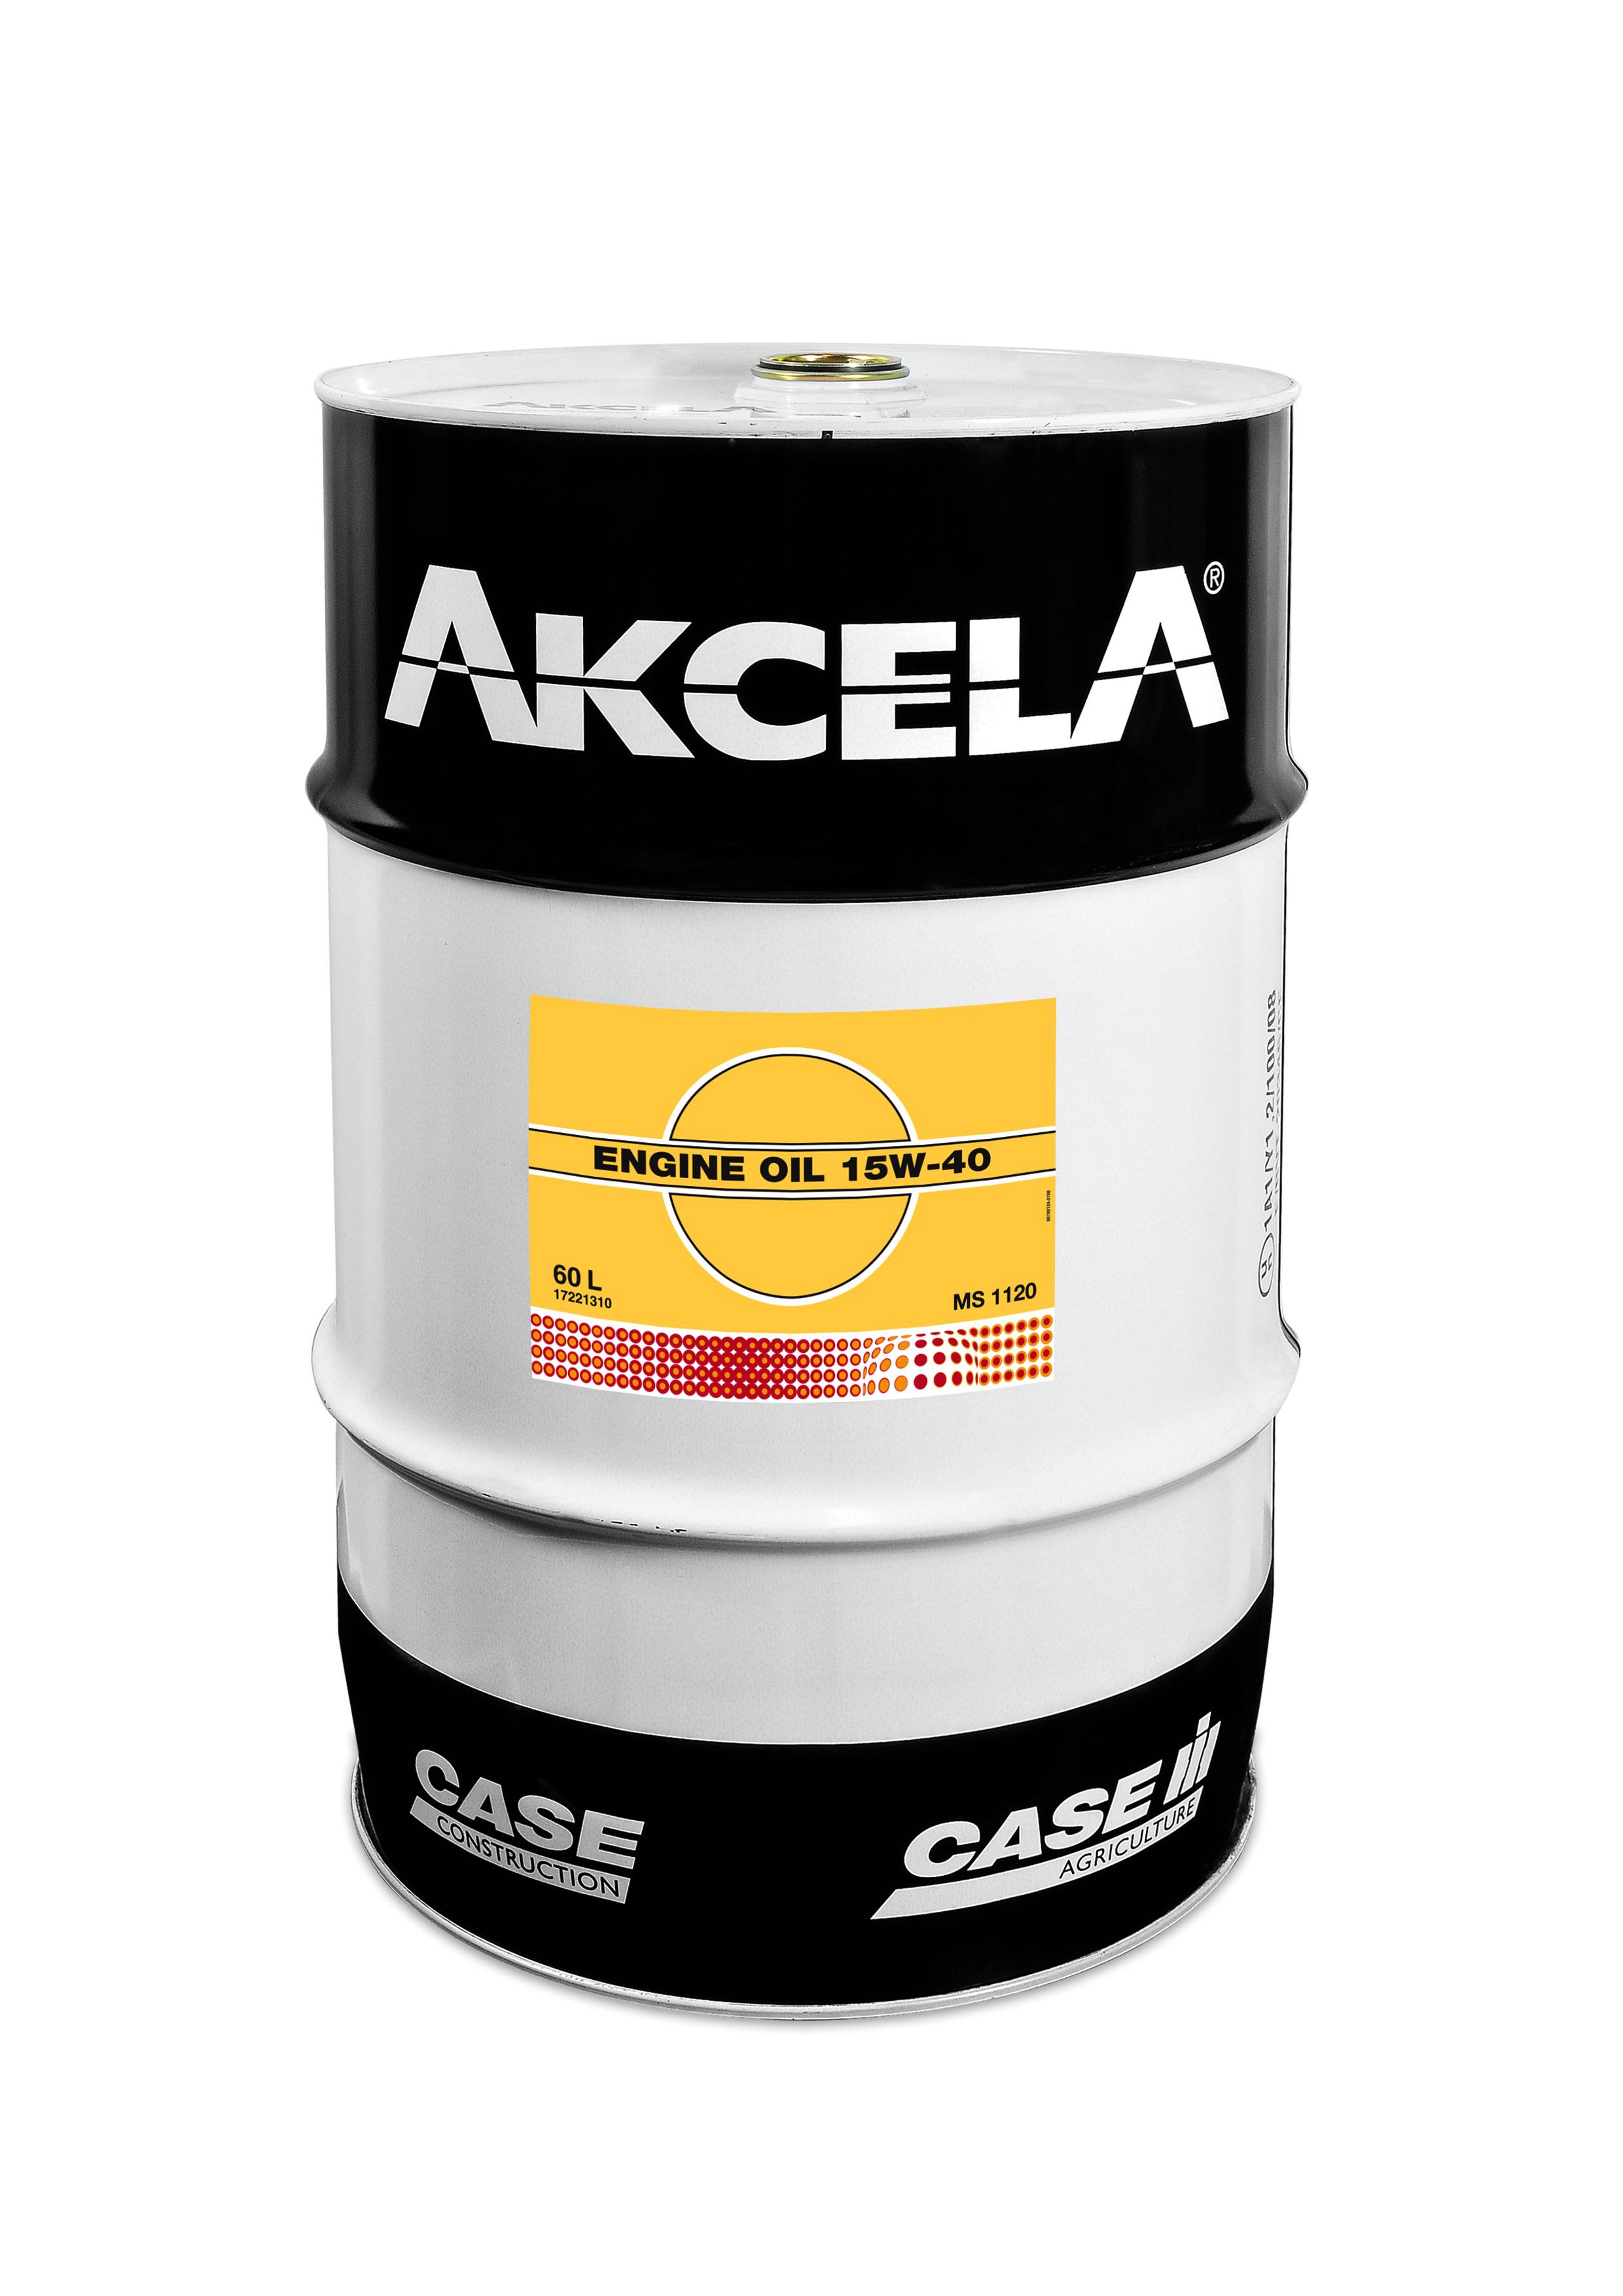 Akcela ENGINE OIL 15W/40